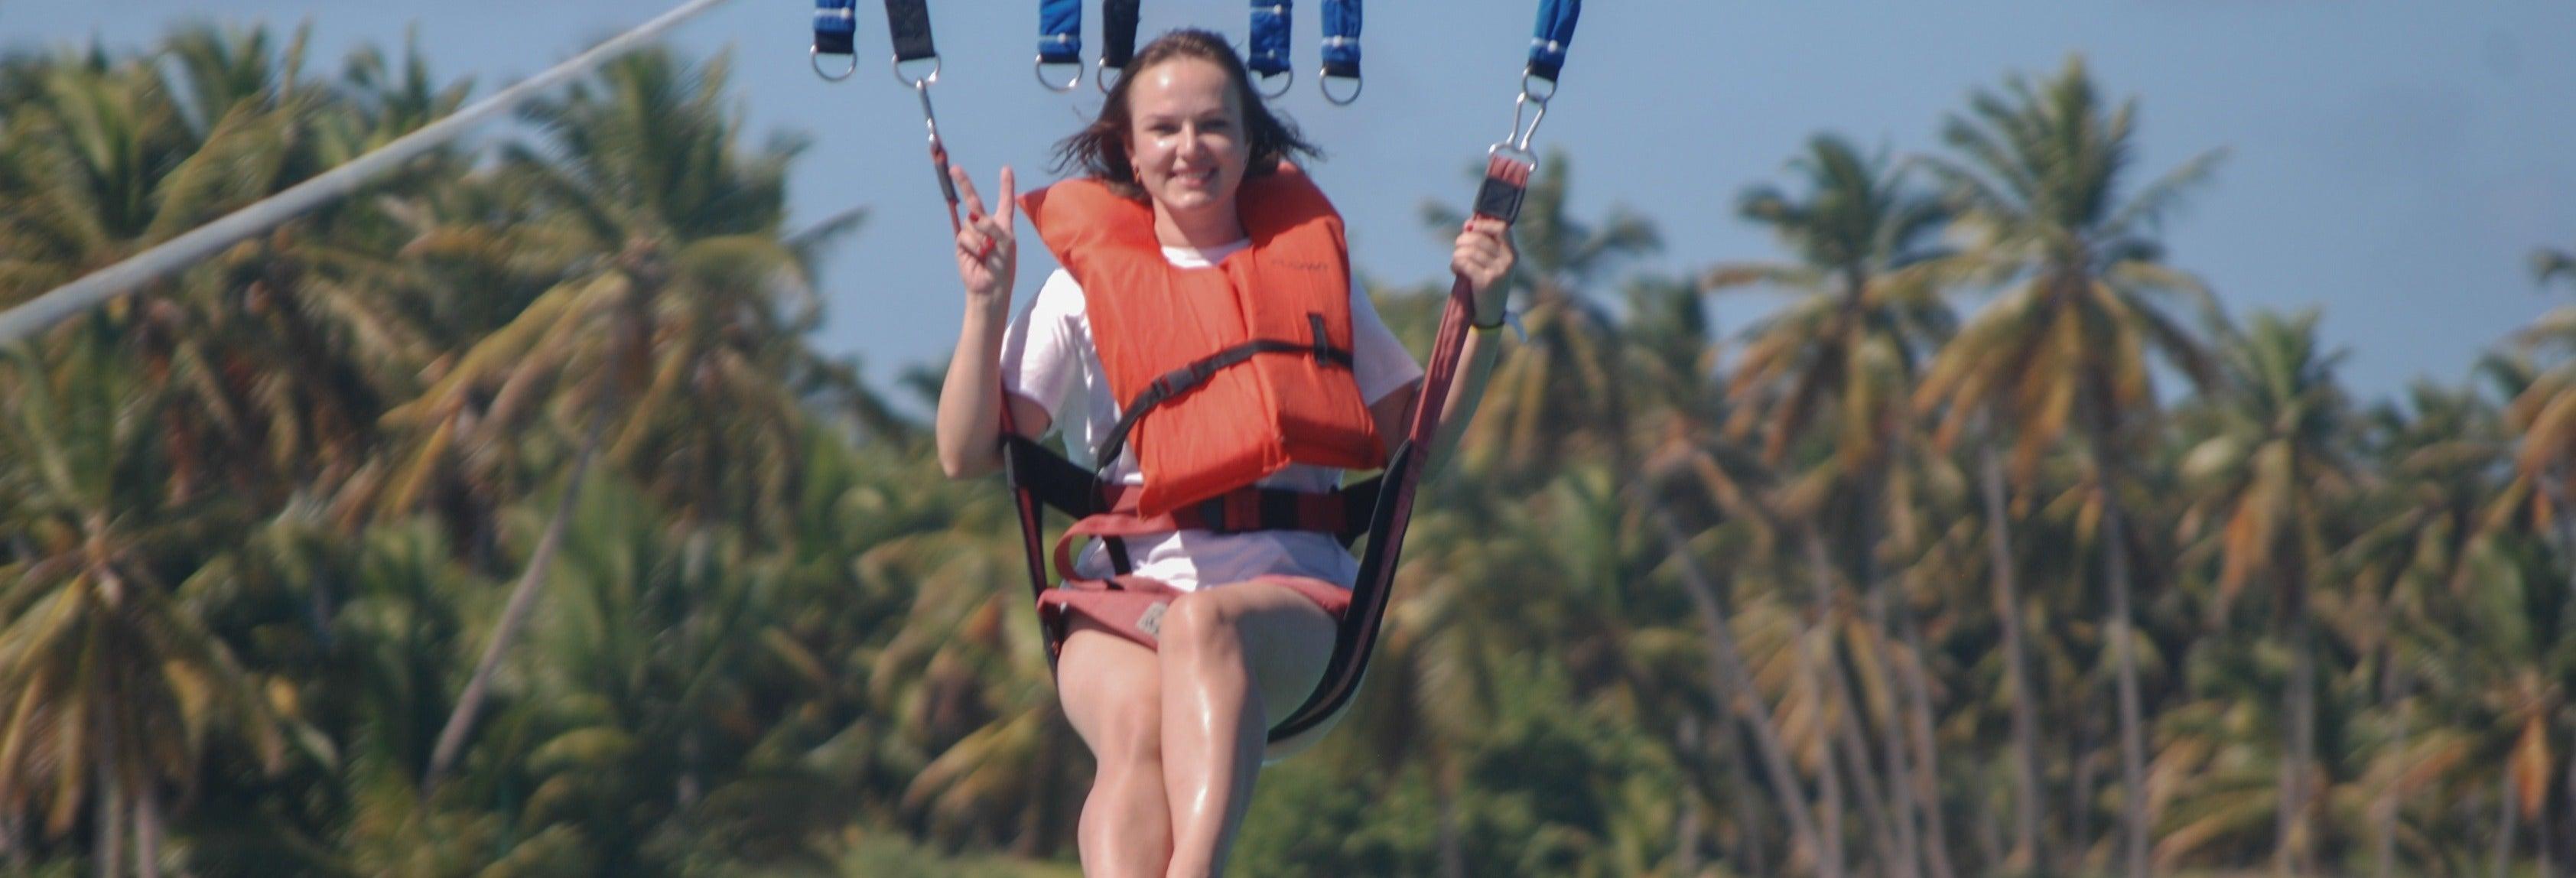 Parasailing en Punta Cana